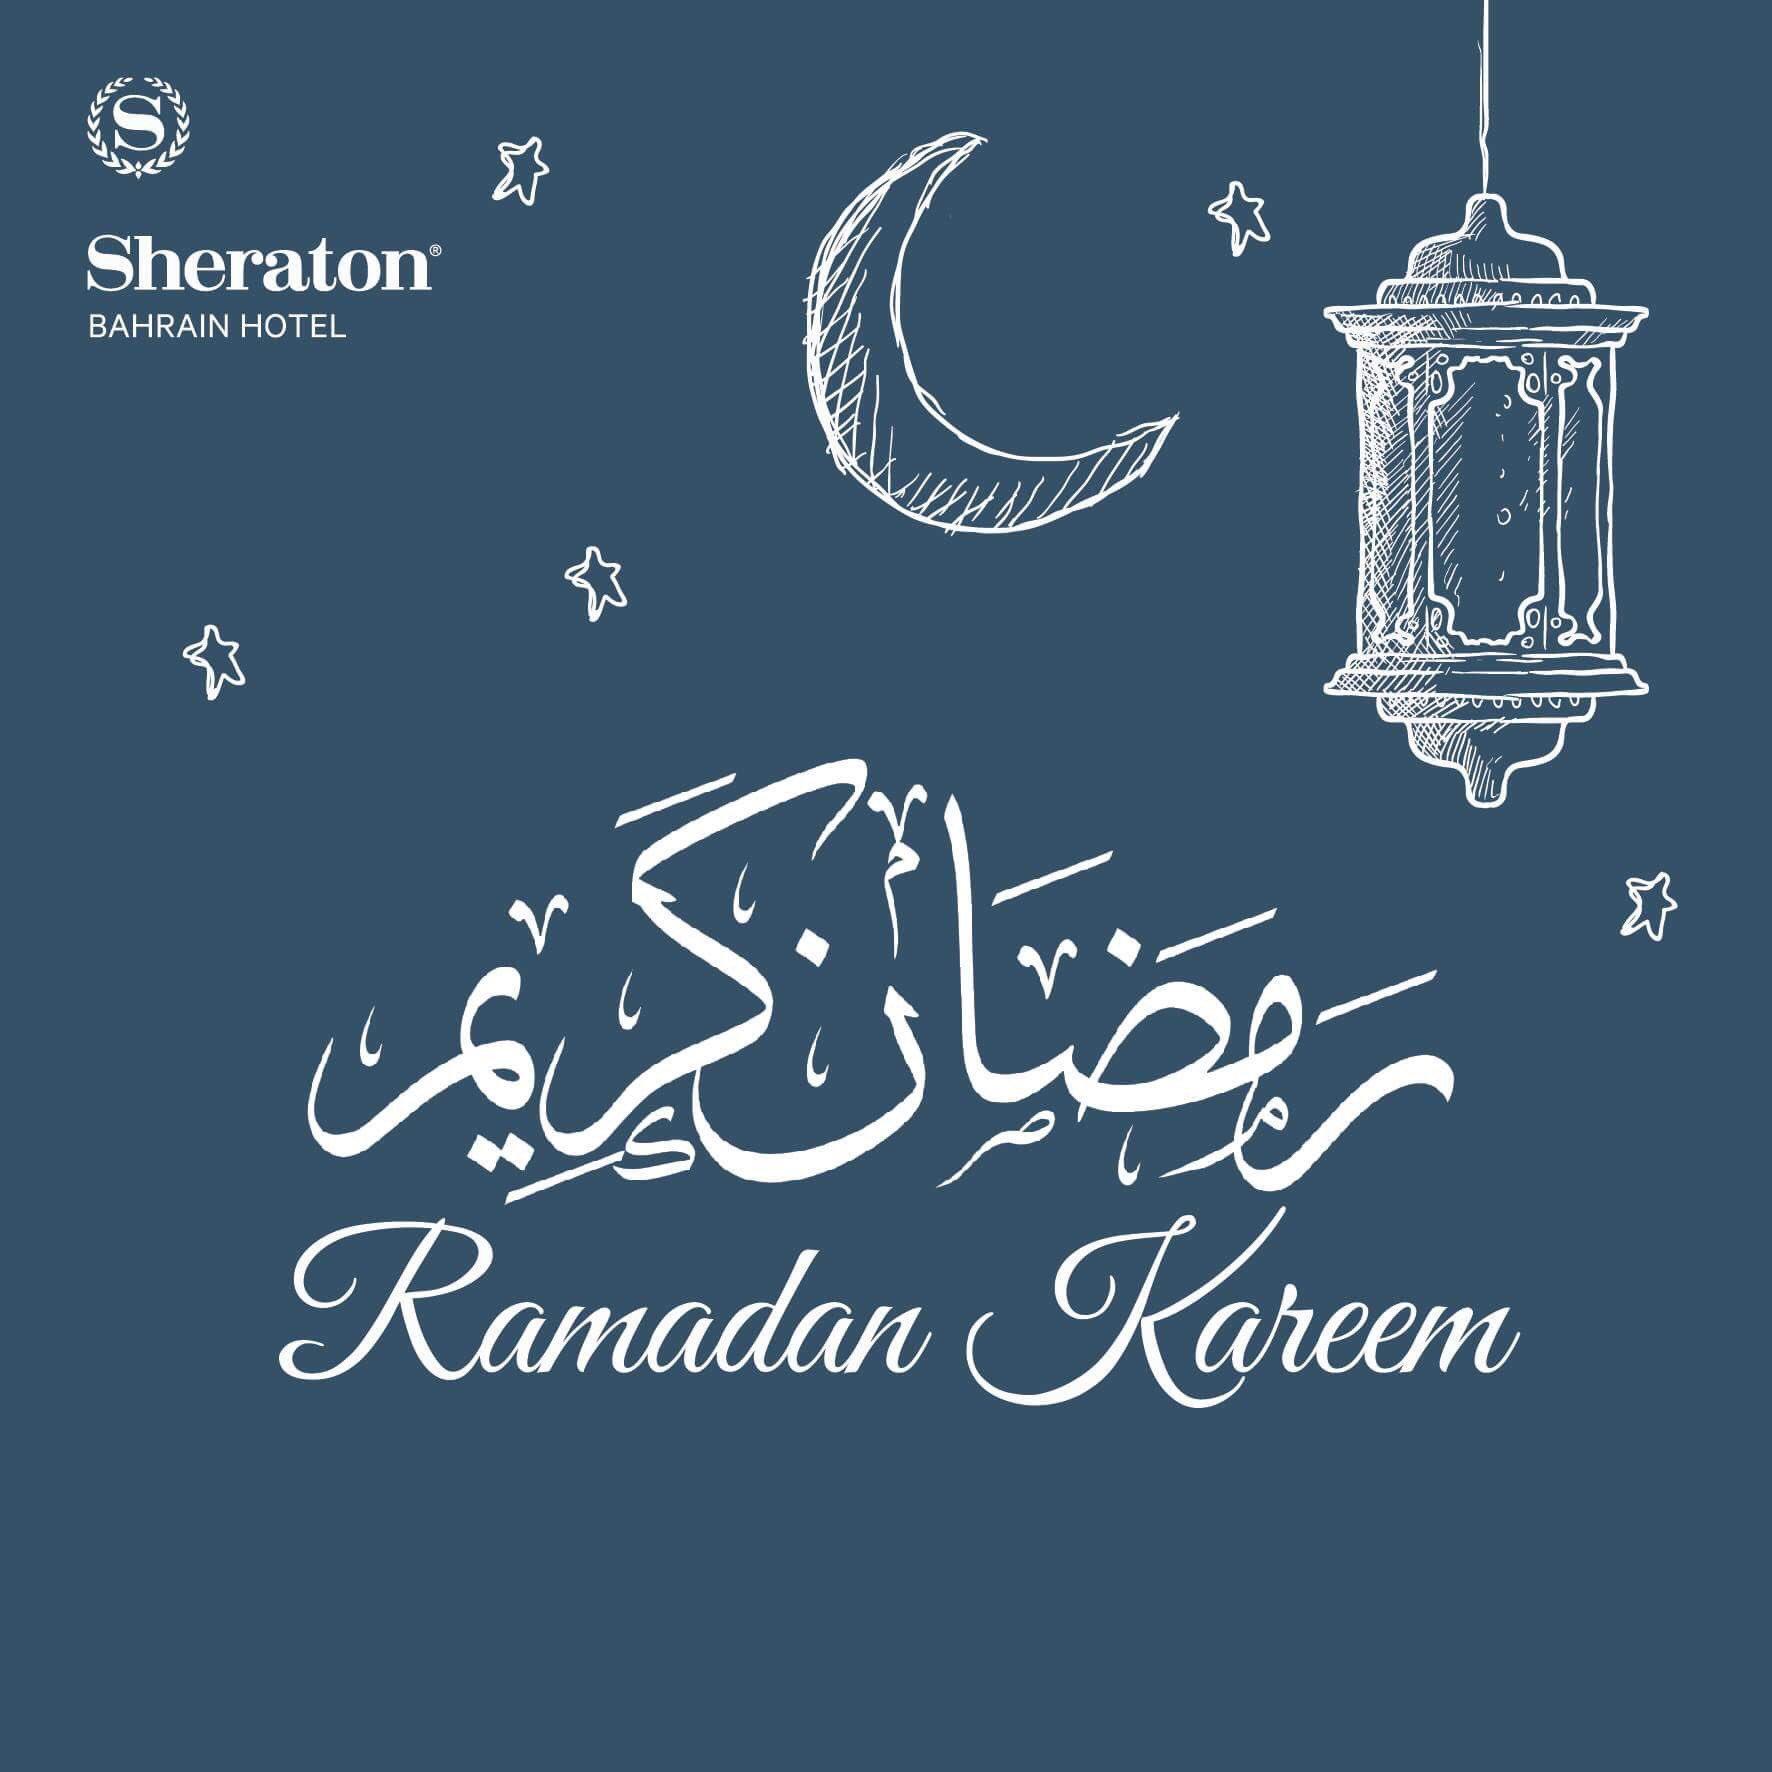 SheratonBahrain_2017-May-26.jpg